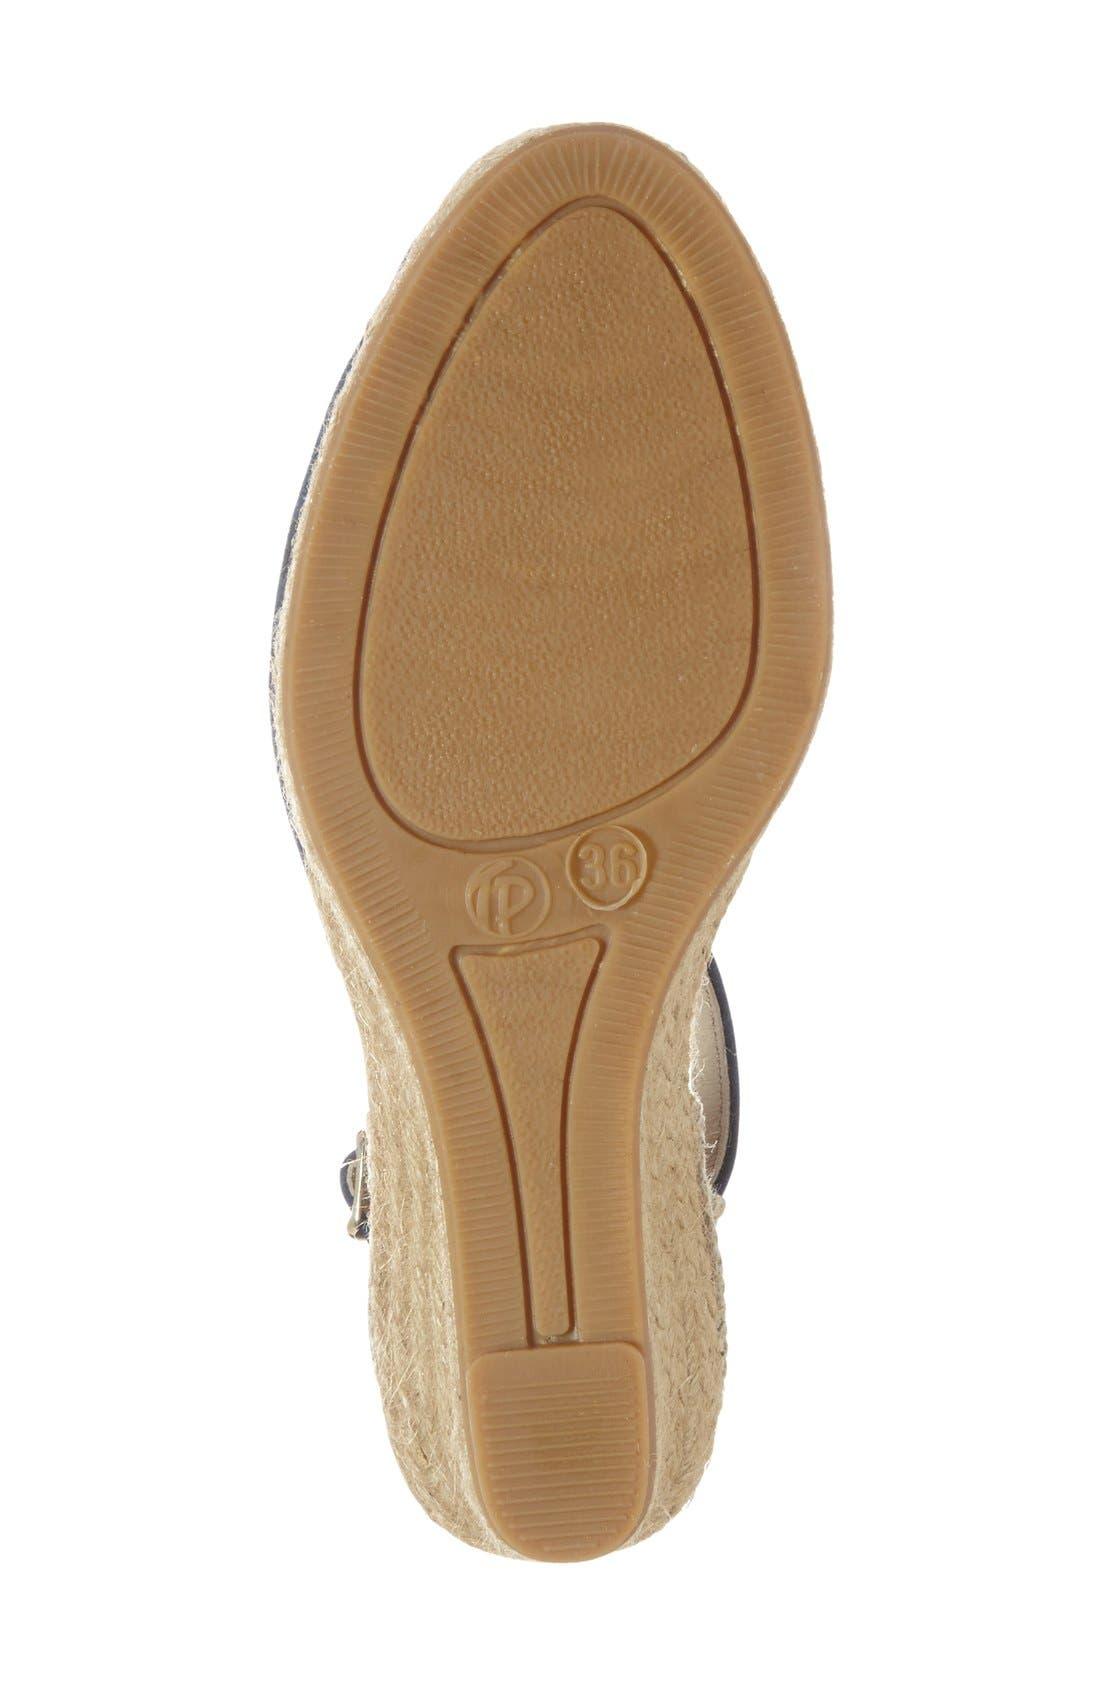 Alternate Image 4  - Toni Pons 'Lloret-5' Espadrille Wedge Sandal (Women)